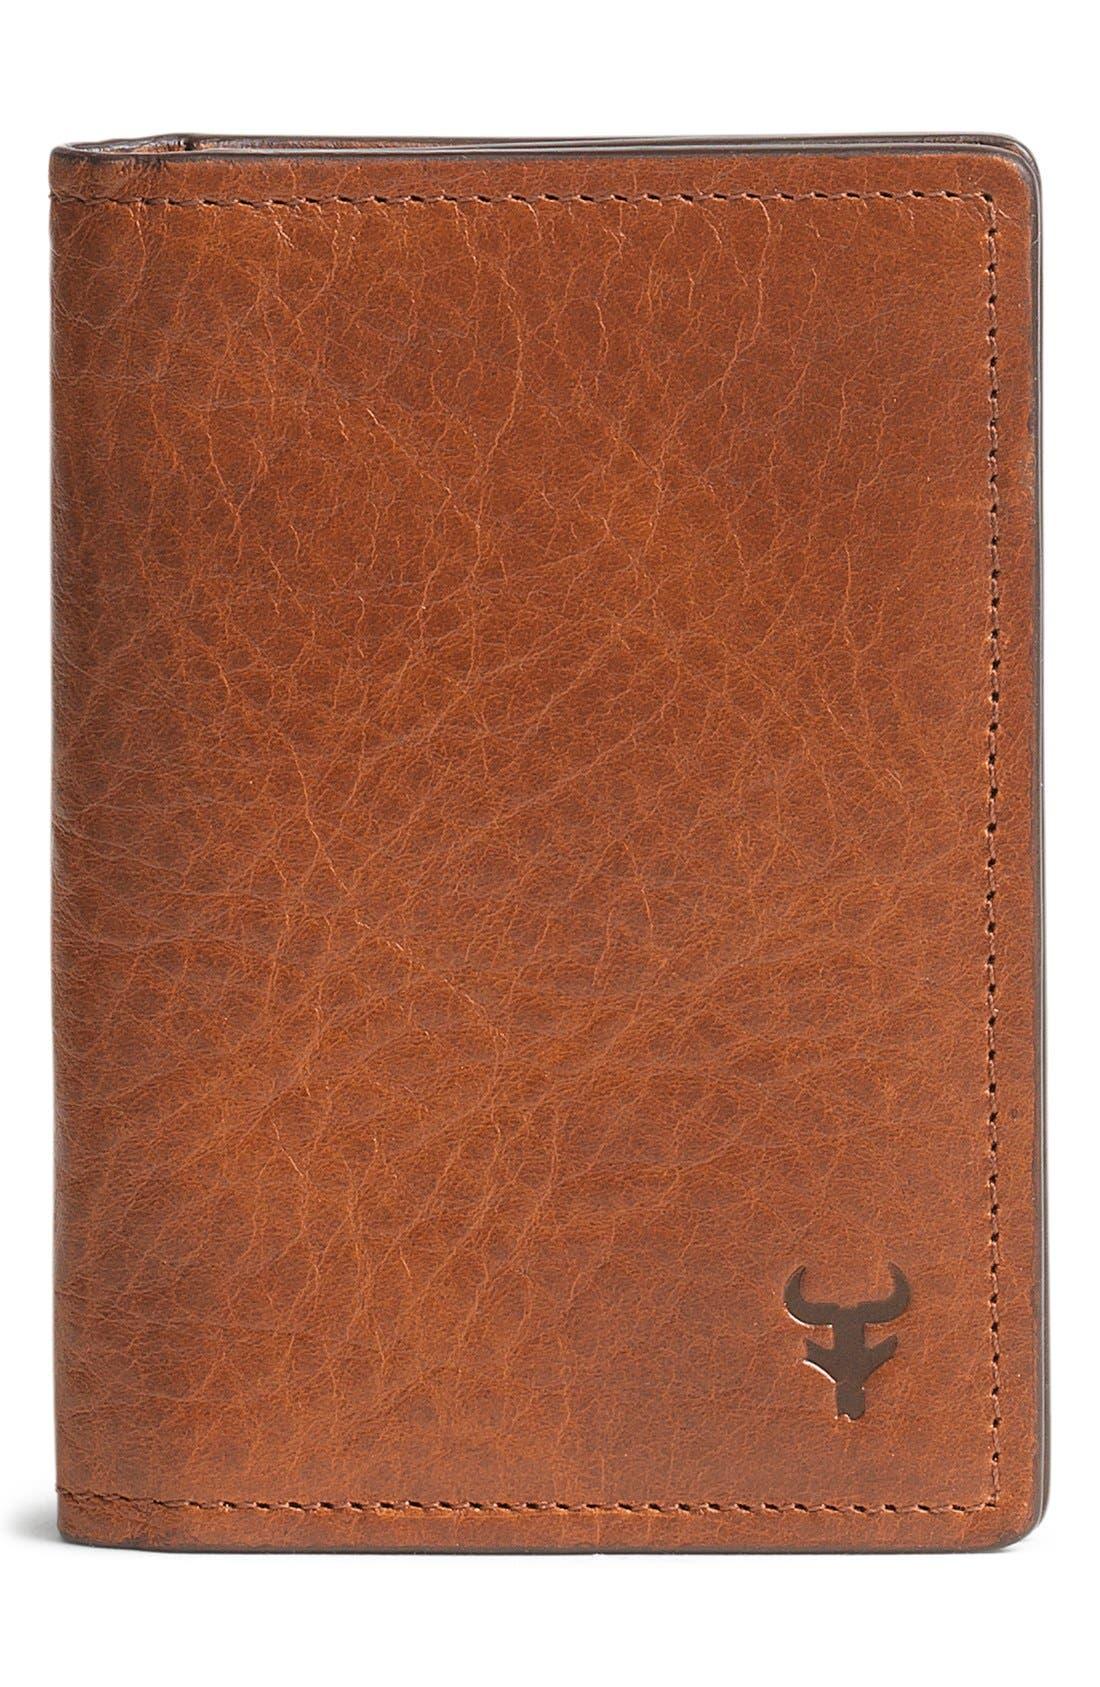 'Jackson' Gusset Pocket Bison Leather Card Case,                             Main thumbnail 1, color,                             200